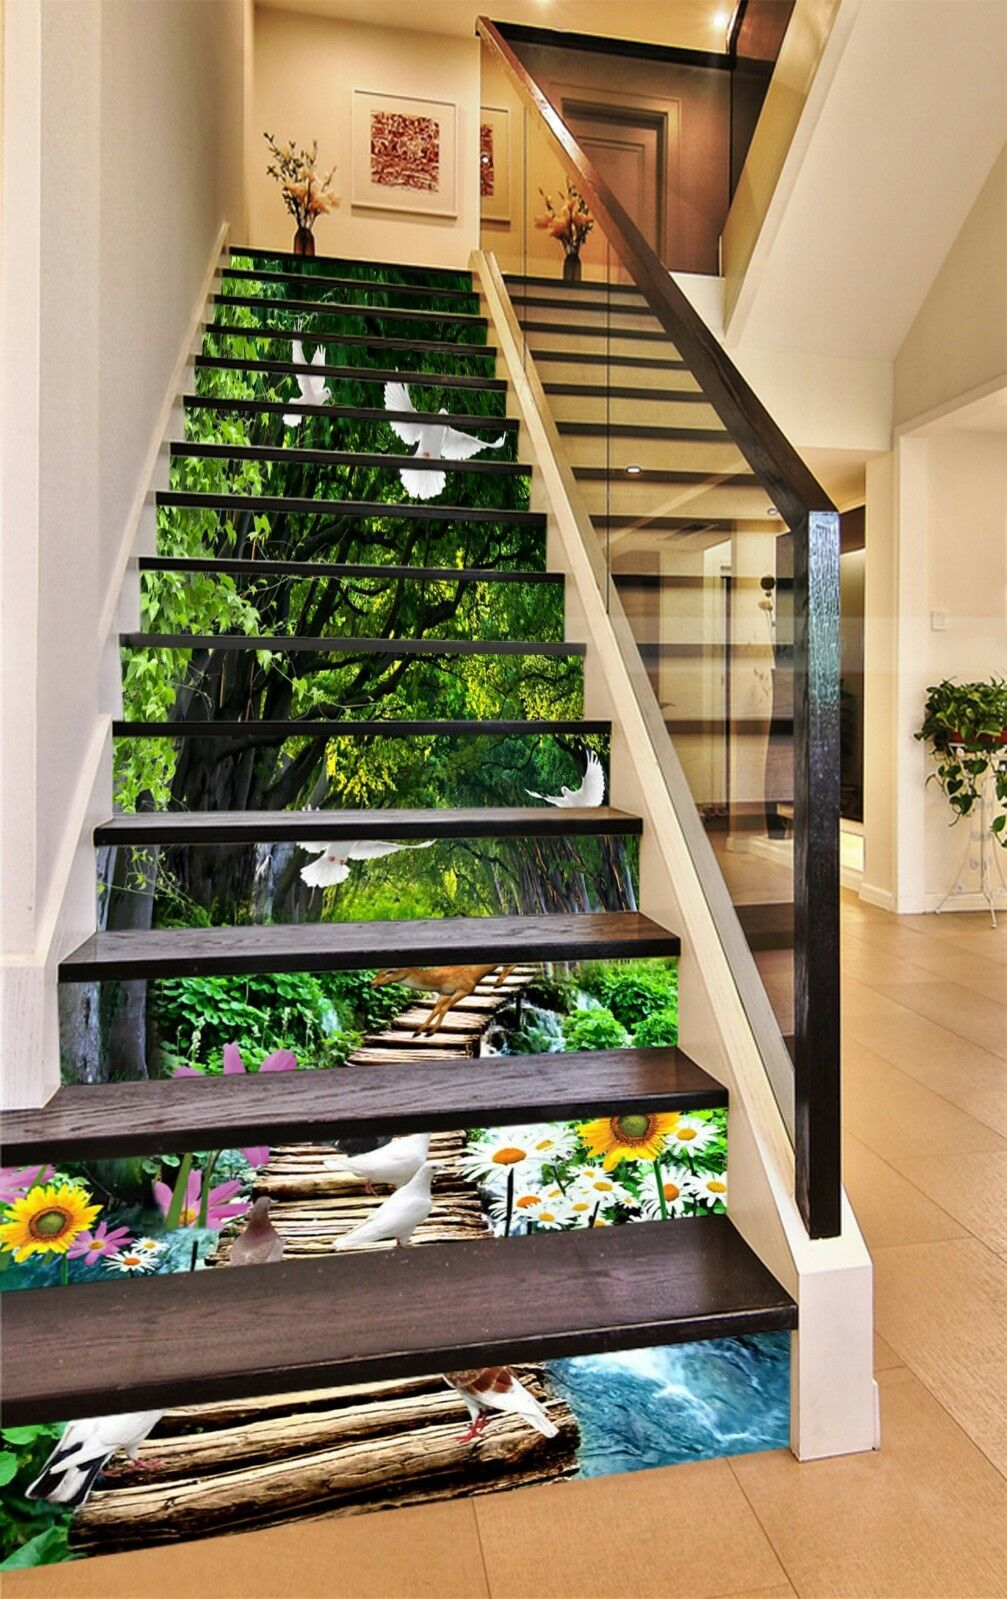 3D bianca Dove Deer Stair Risers Decoration Photo Mural Vinyl Decal Wallpaper CA